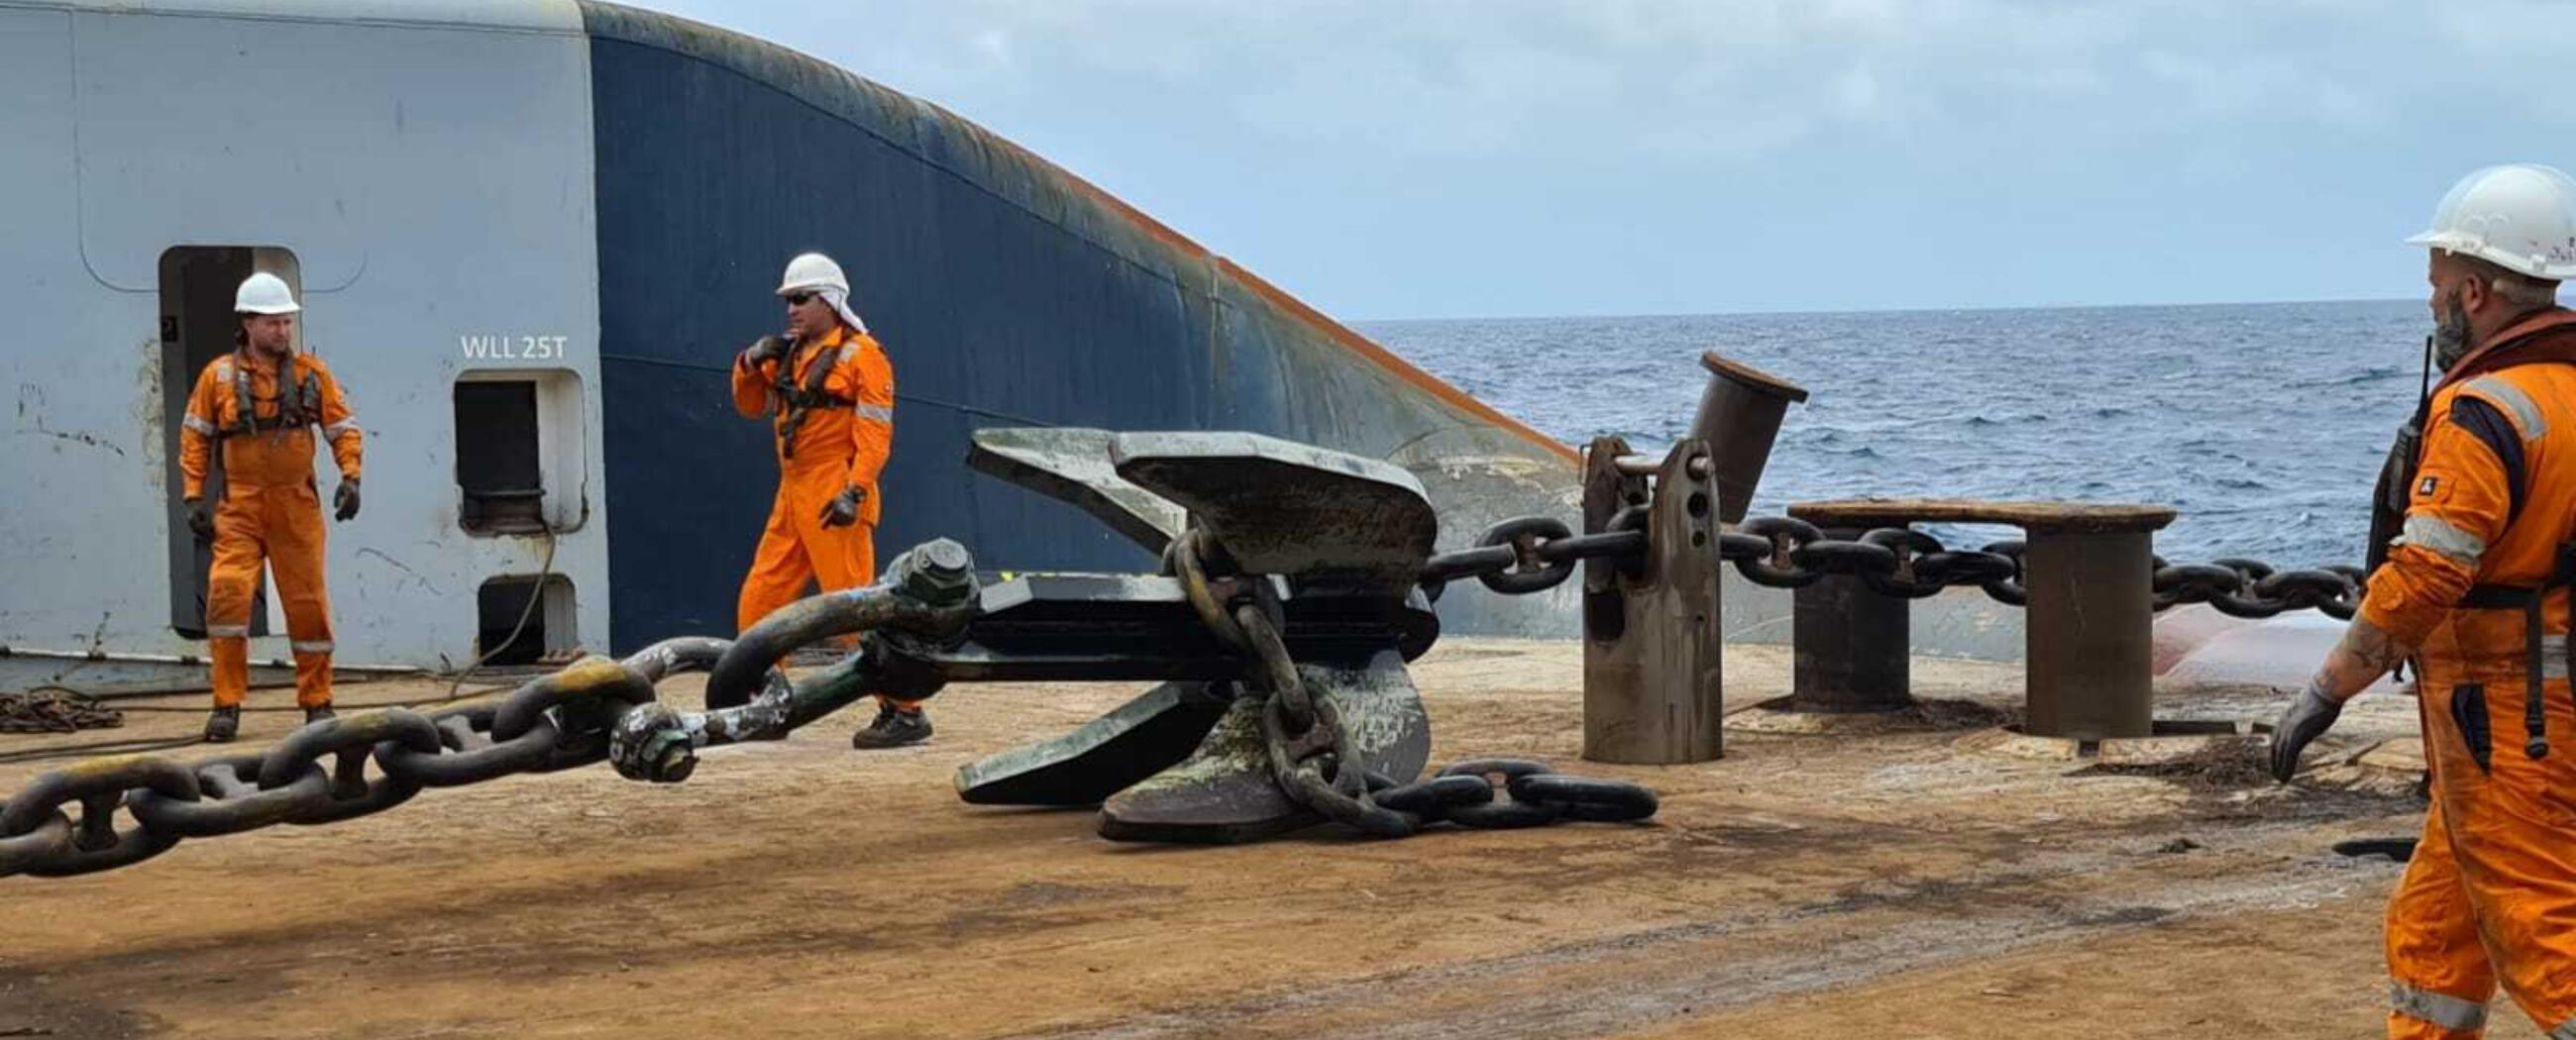 ALP-Striker-anchor-handling-Aruba.jpg